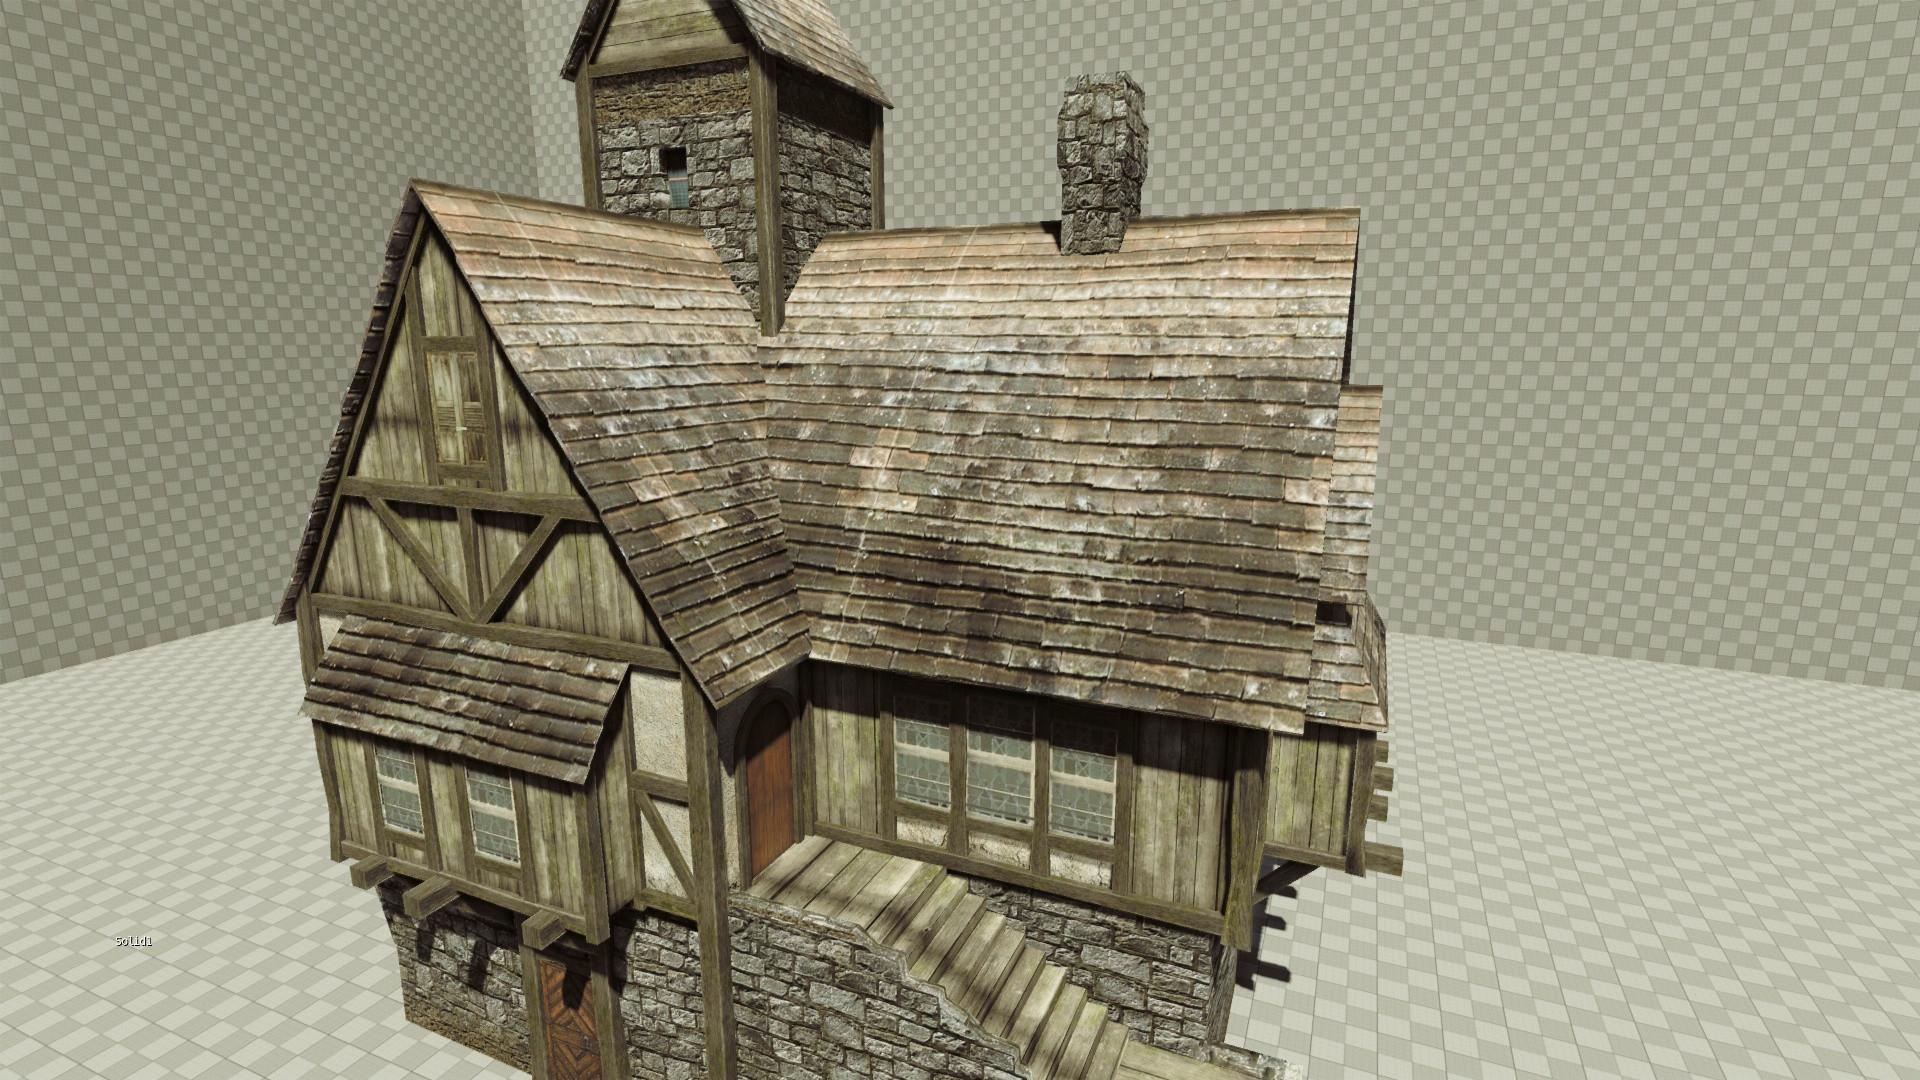 https://tf3dm.com/3d-model/medieval-house-4919.html   CS188_Assets    Pinterest   Medieval, 3d and Art 3d